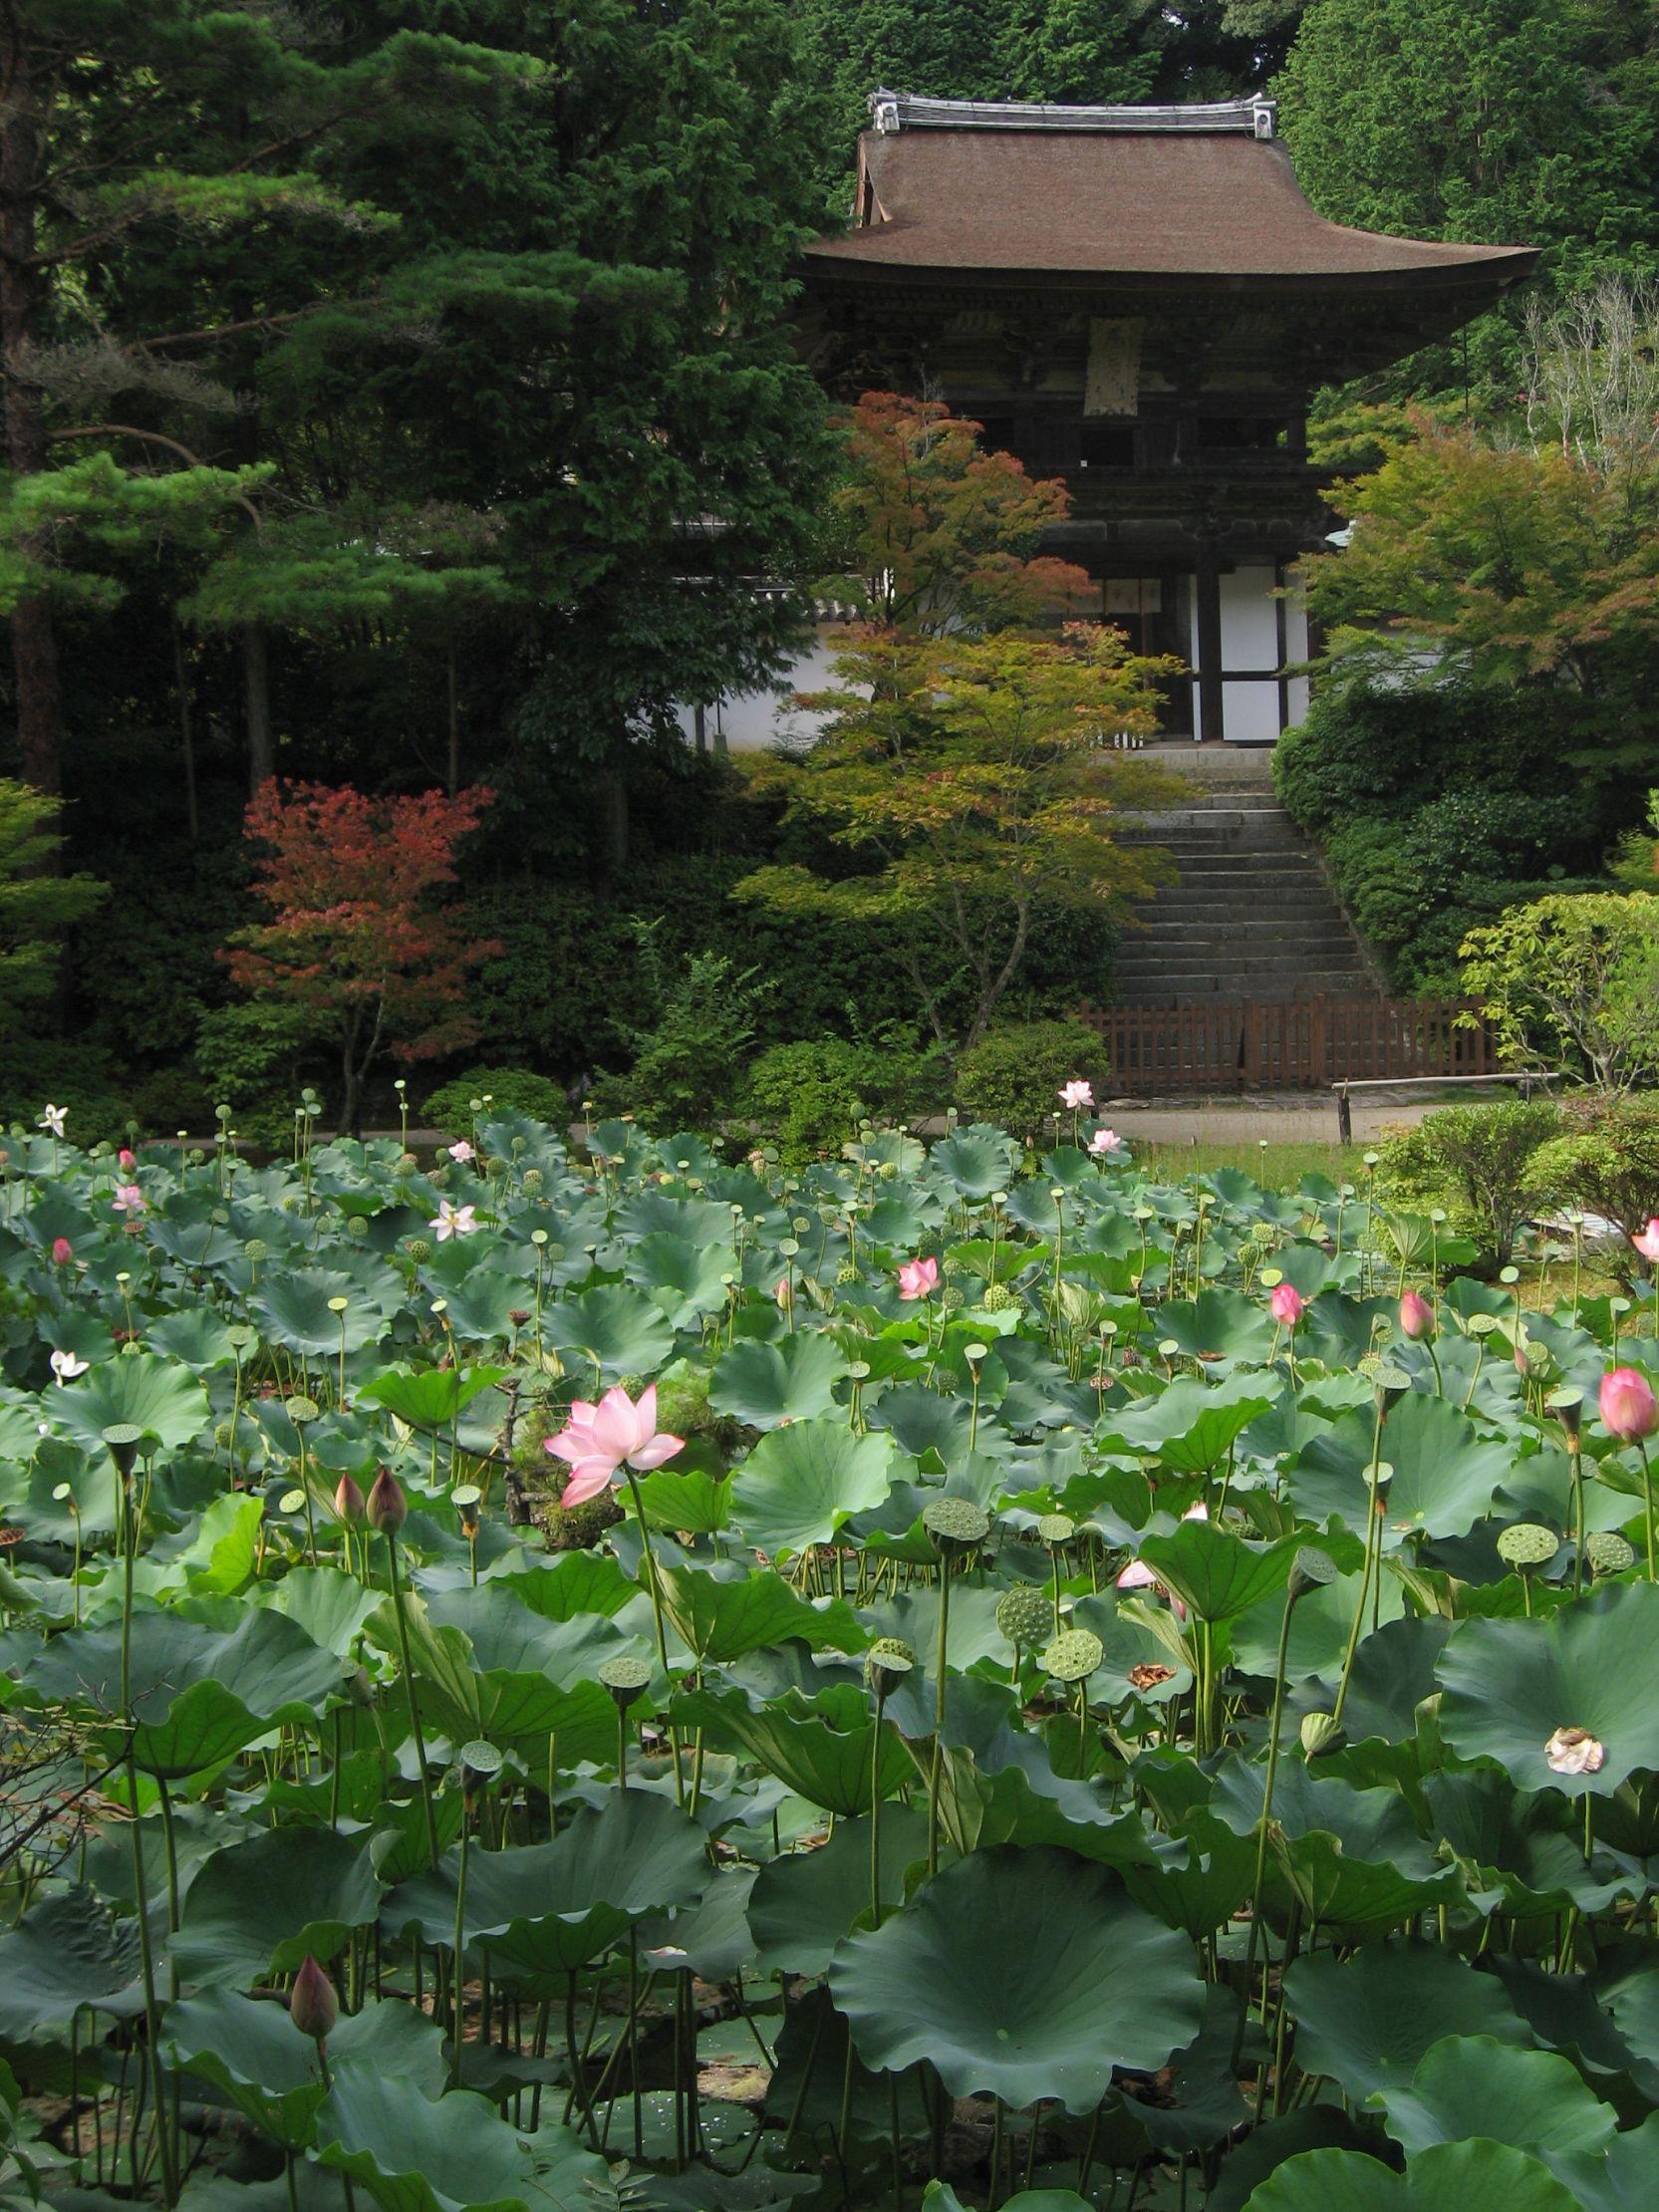 Lotus Pond At Enjo Ji, A Heian Period Paradise Garden (12Th